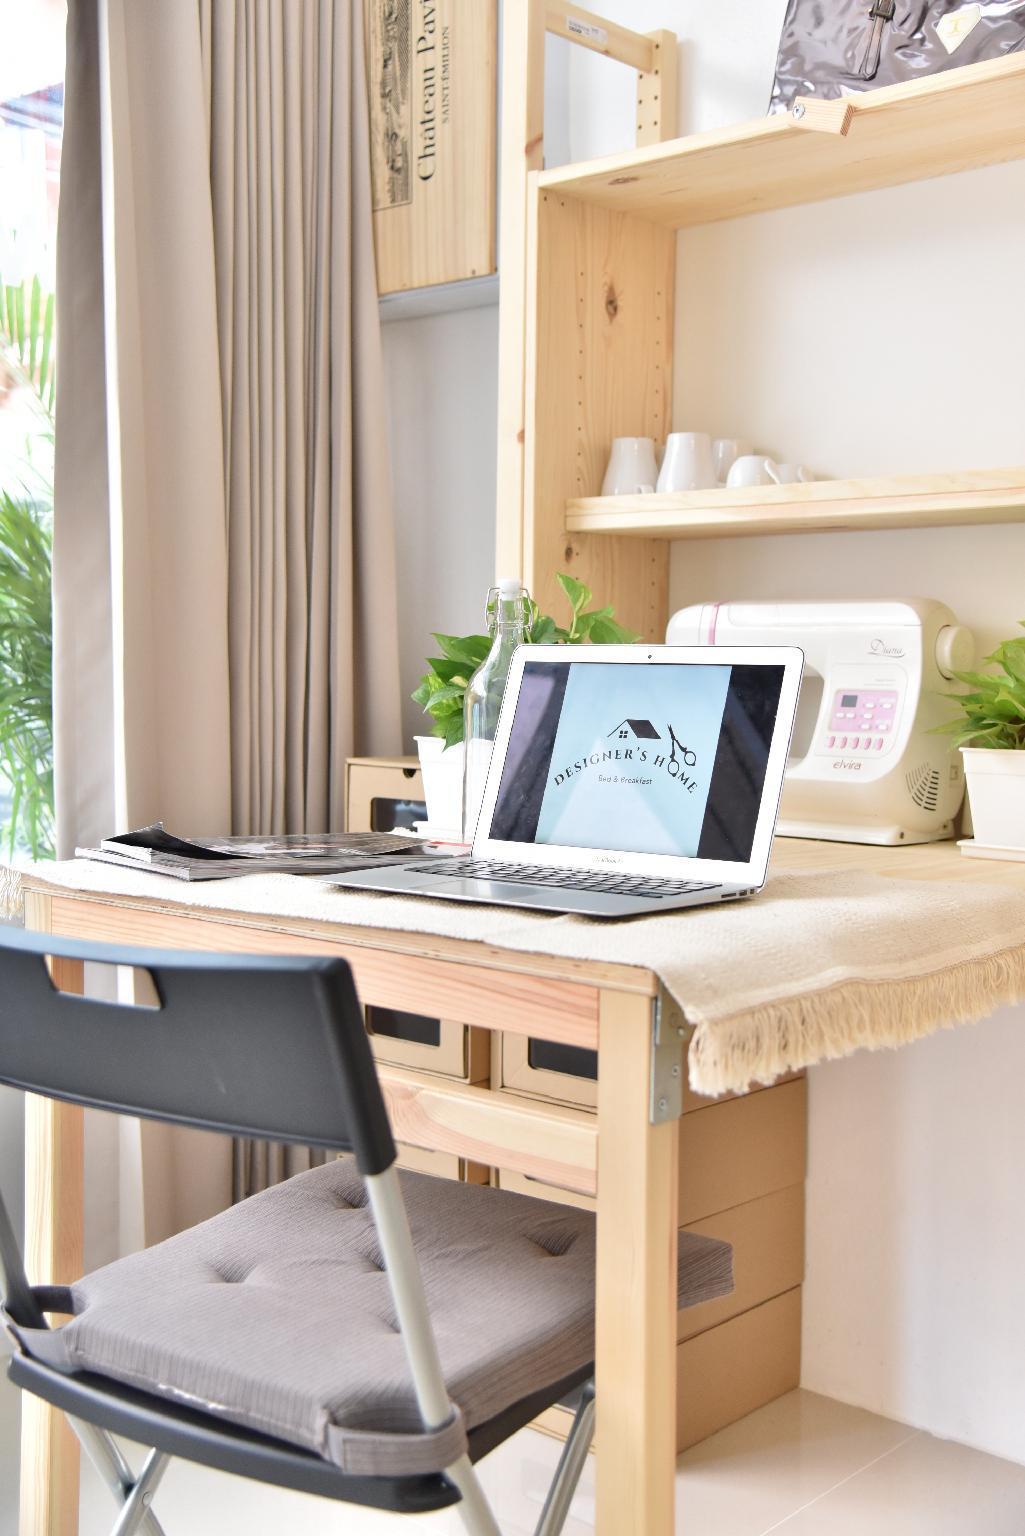 Designer's Home202